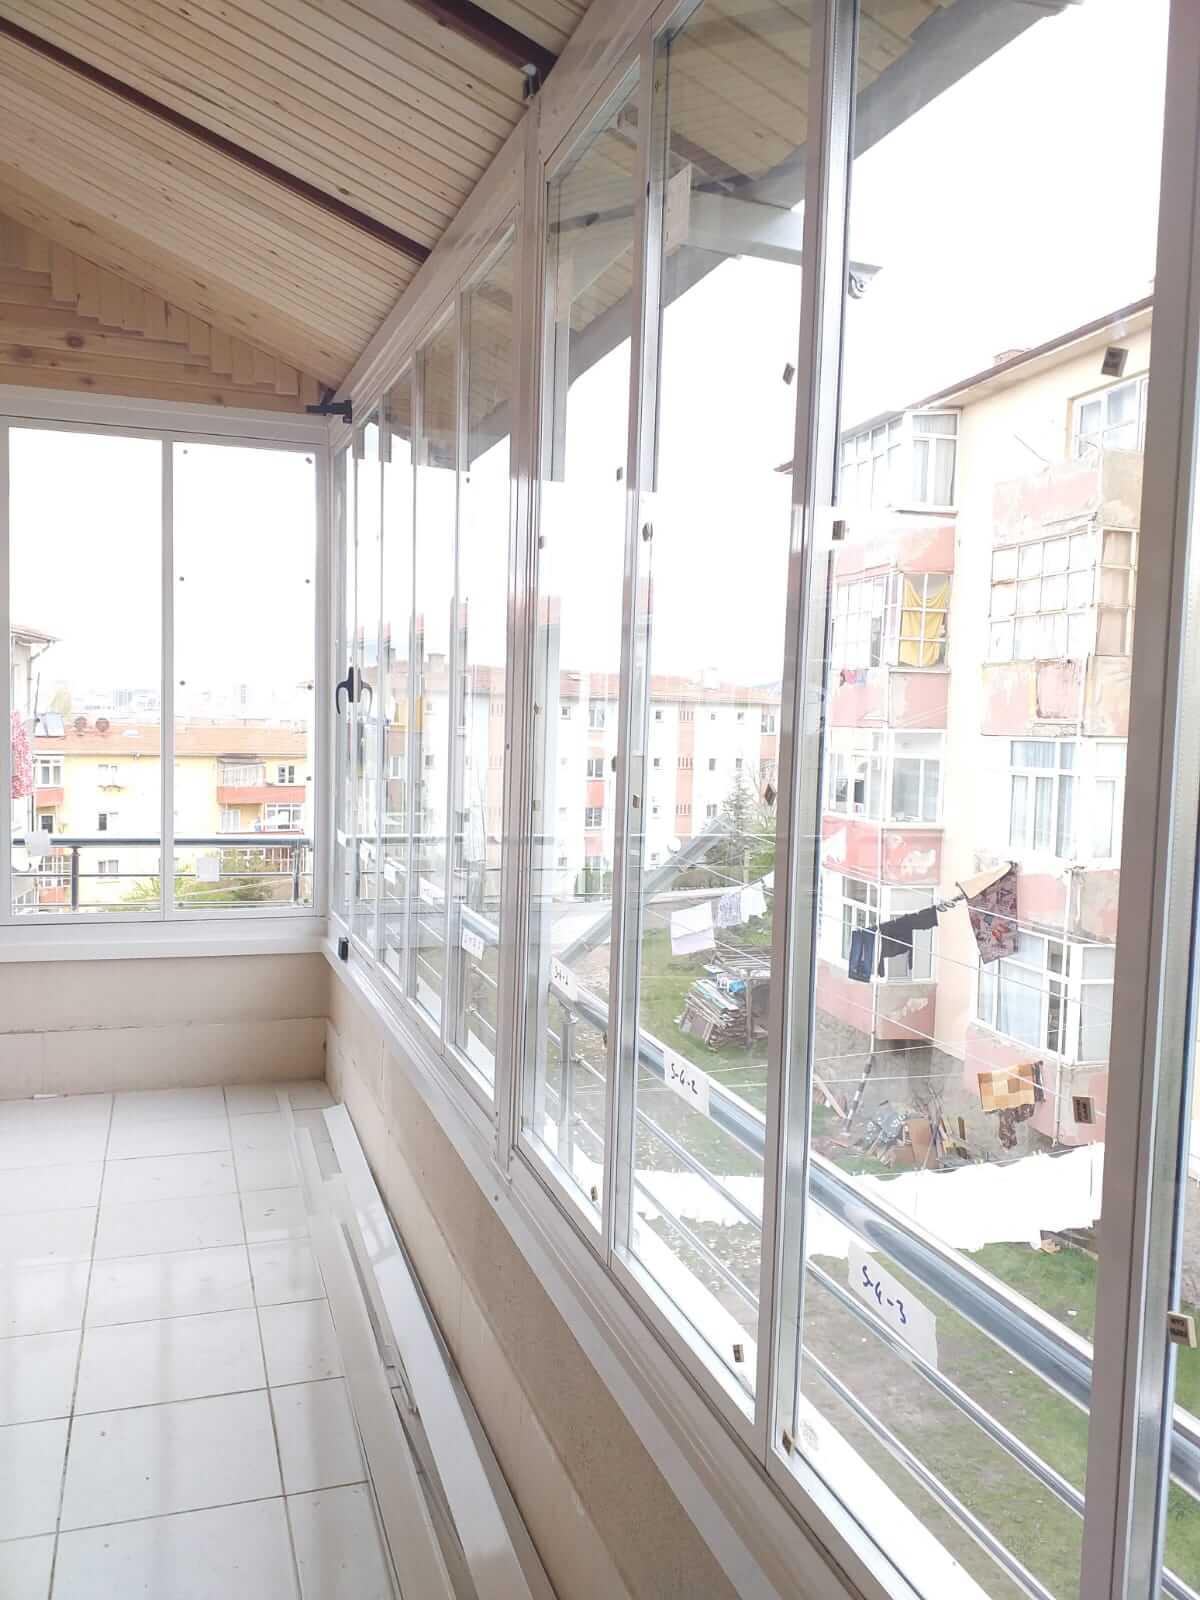 Ankara Ümitköy Isıcamlı Cam Balkon